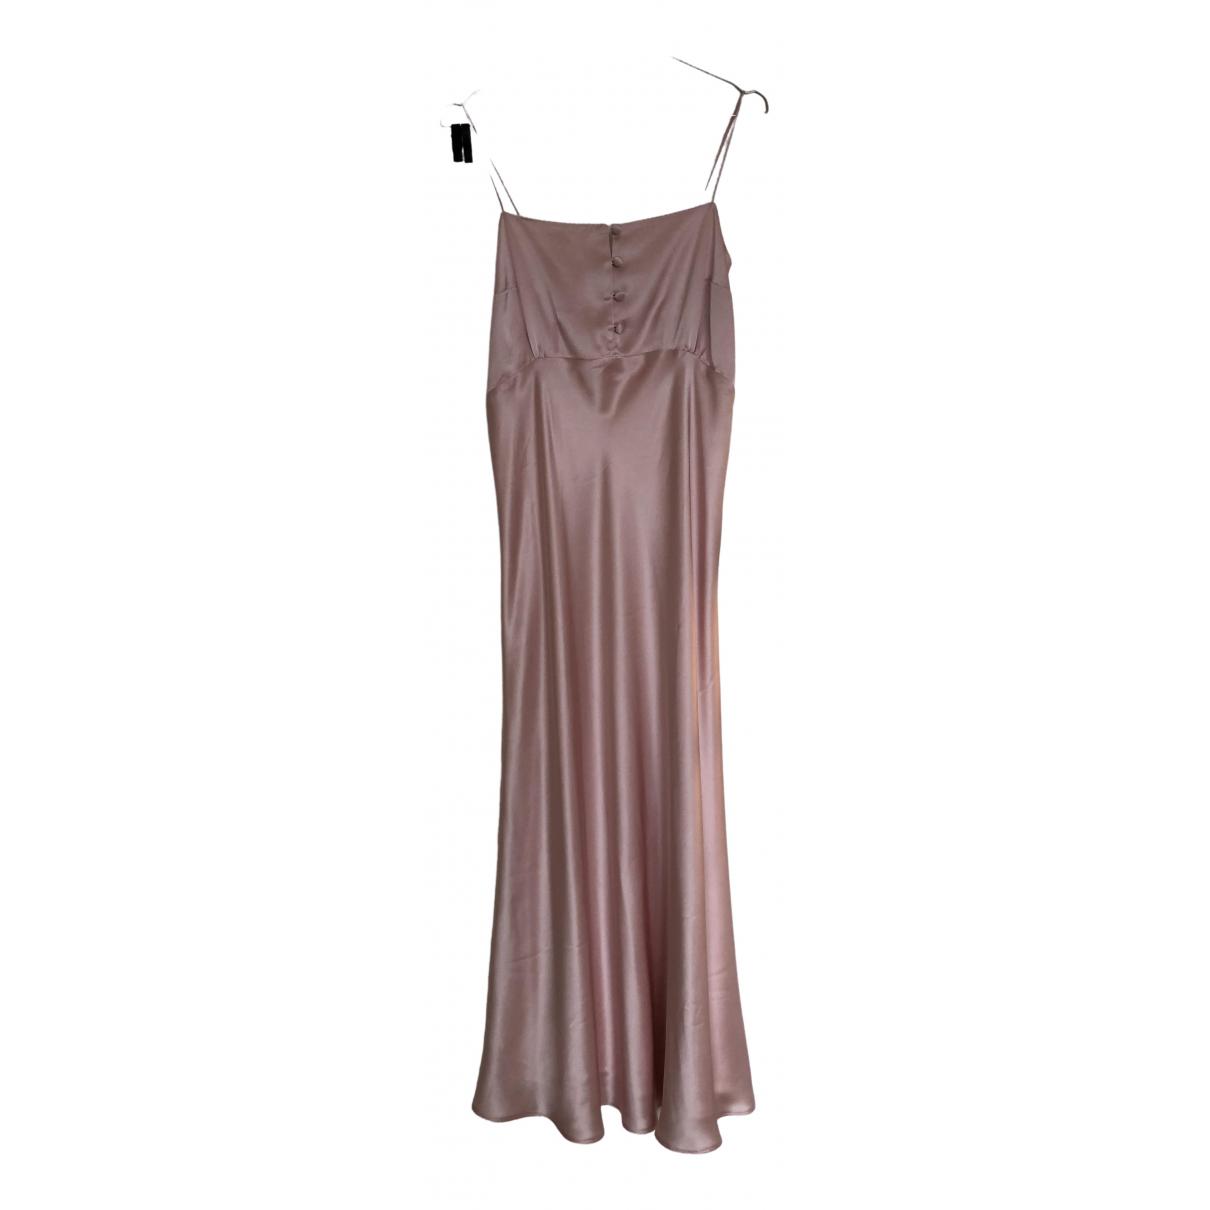 Bernadette - Robe   pour femme en soie - rose